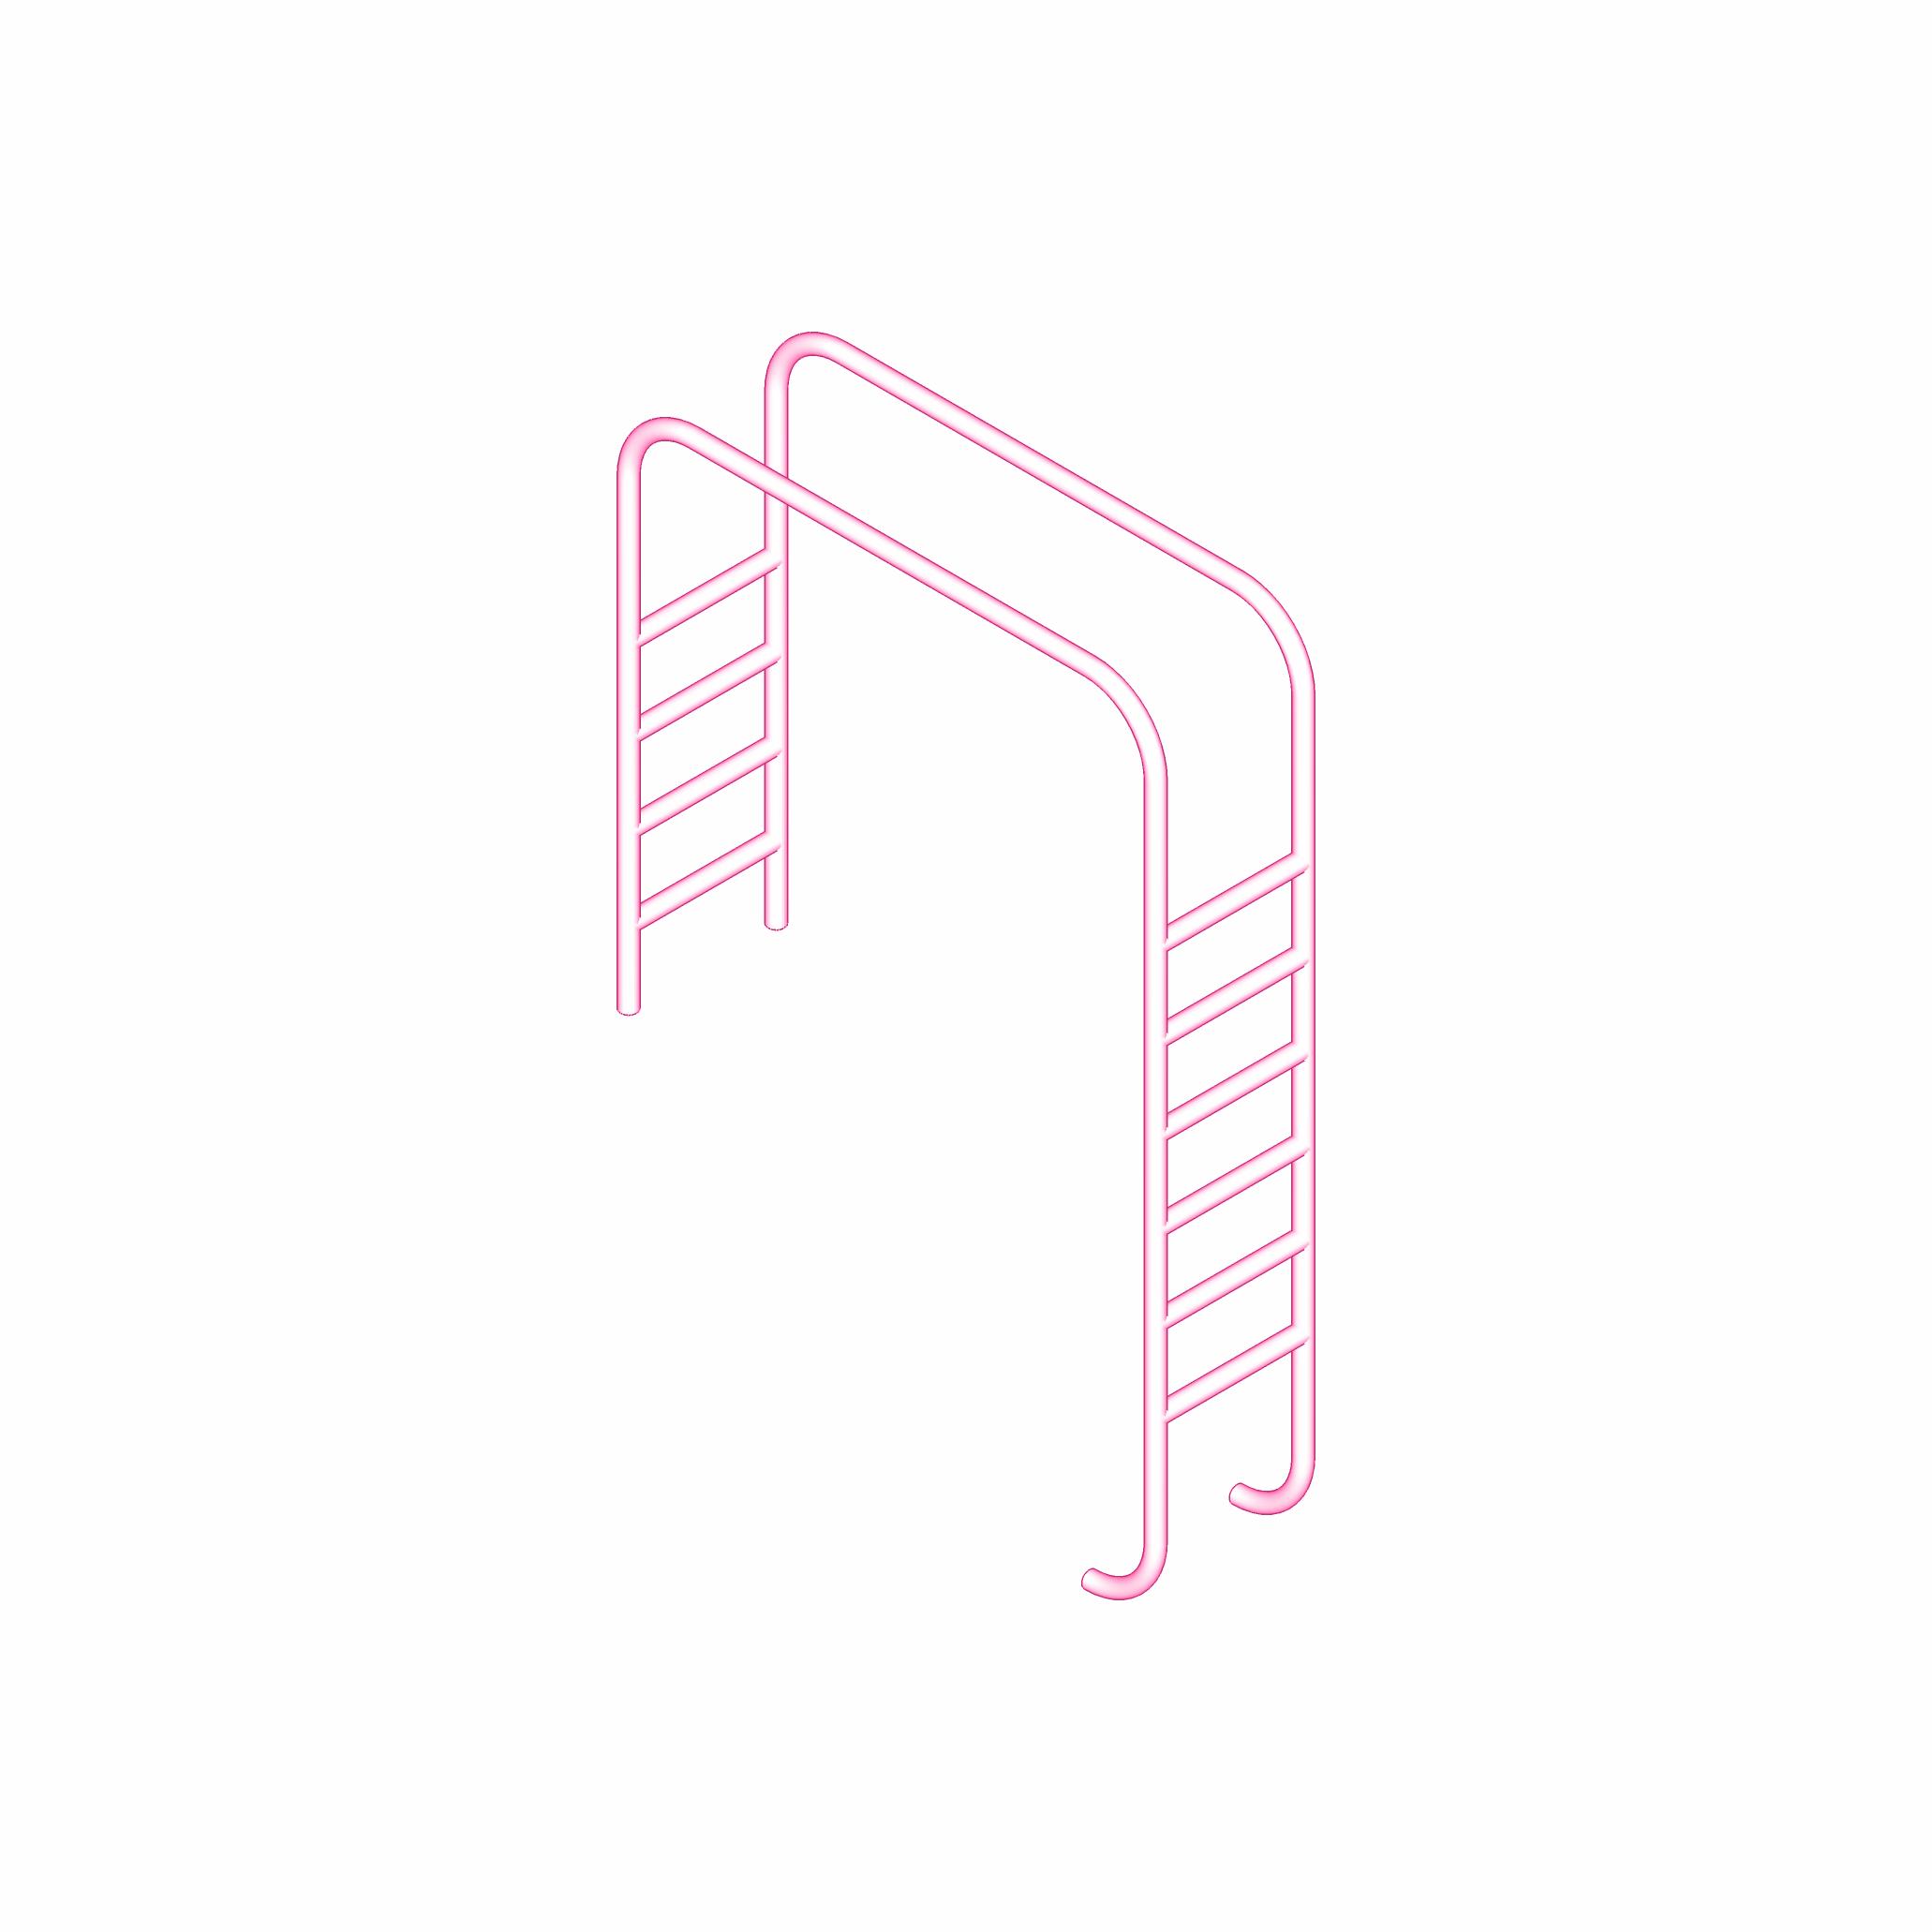 Quarry-Ladder-01 - pink.jpg